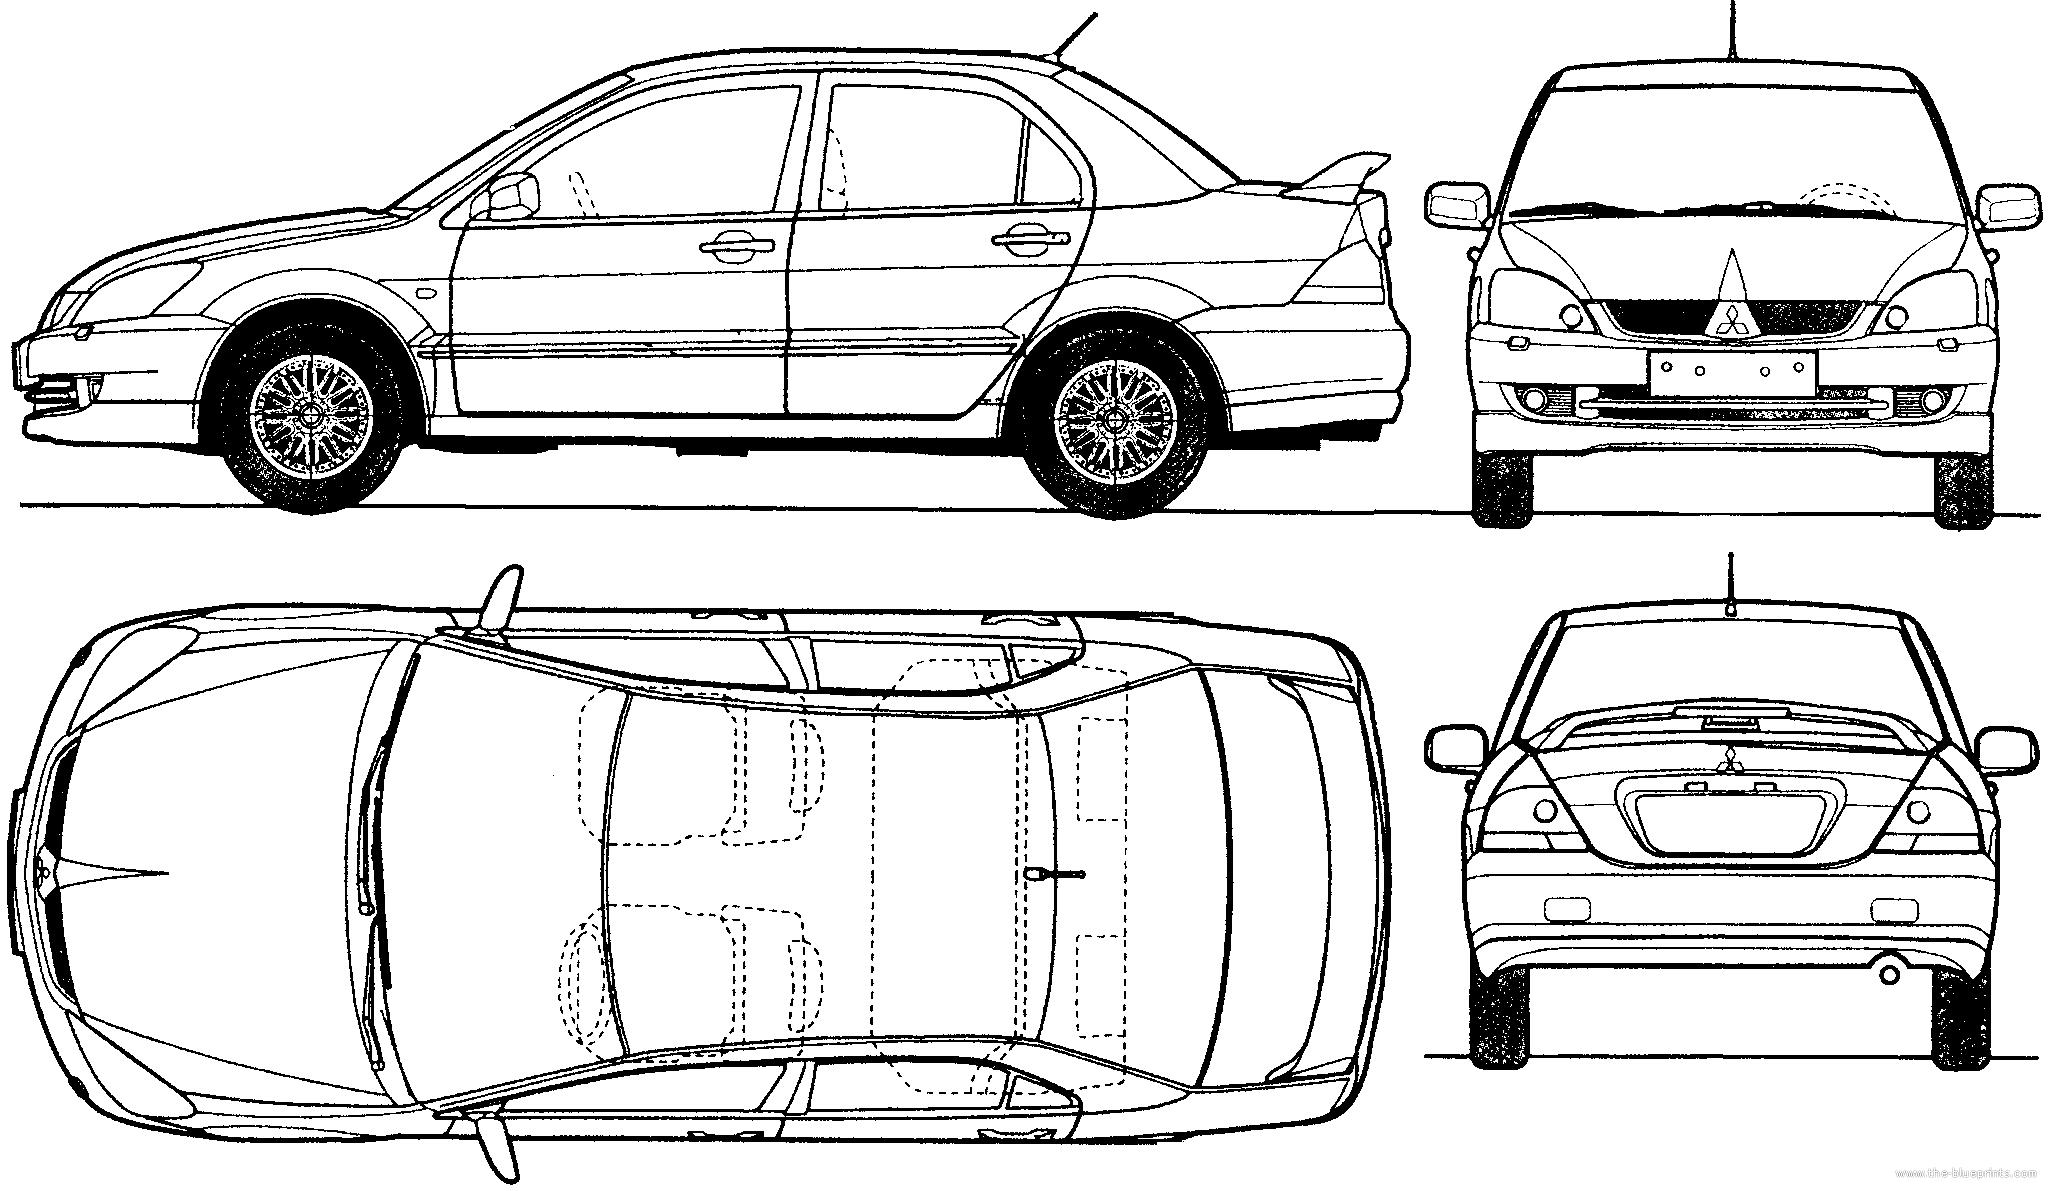 Blueprints > Cars > Mitsubishi > Mitsubishi Lancer (2005)